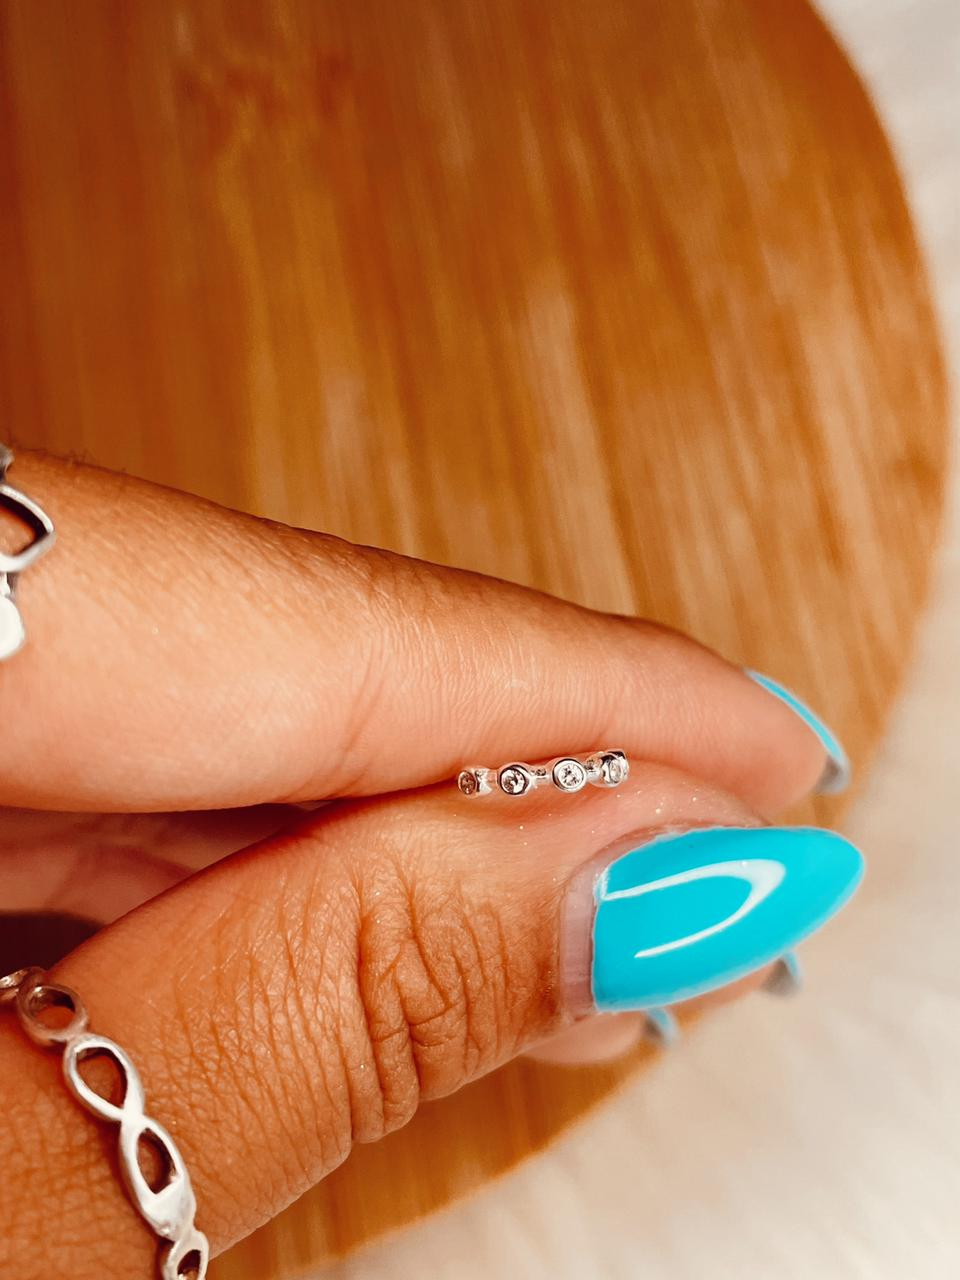 Piercing de Furo de Prata Esfera com Zircônia